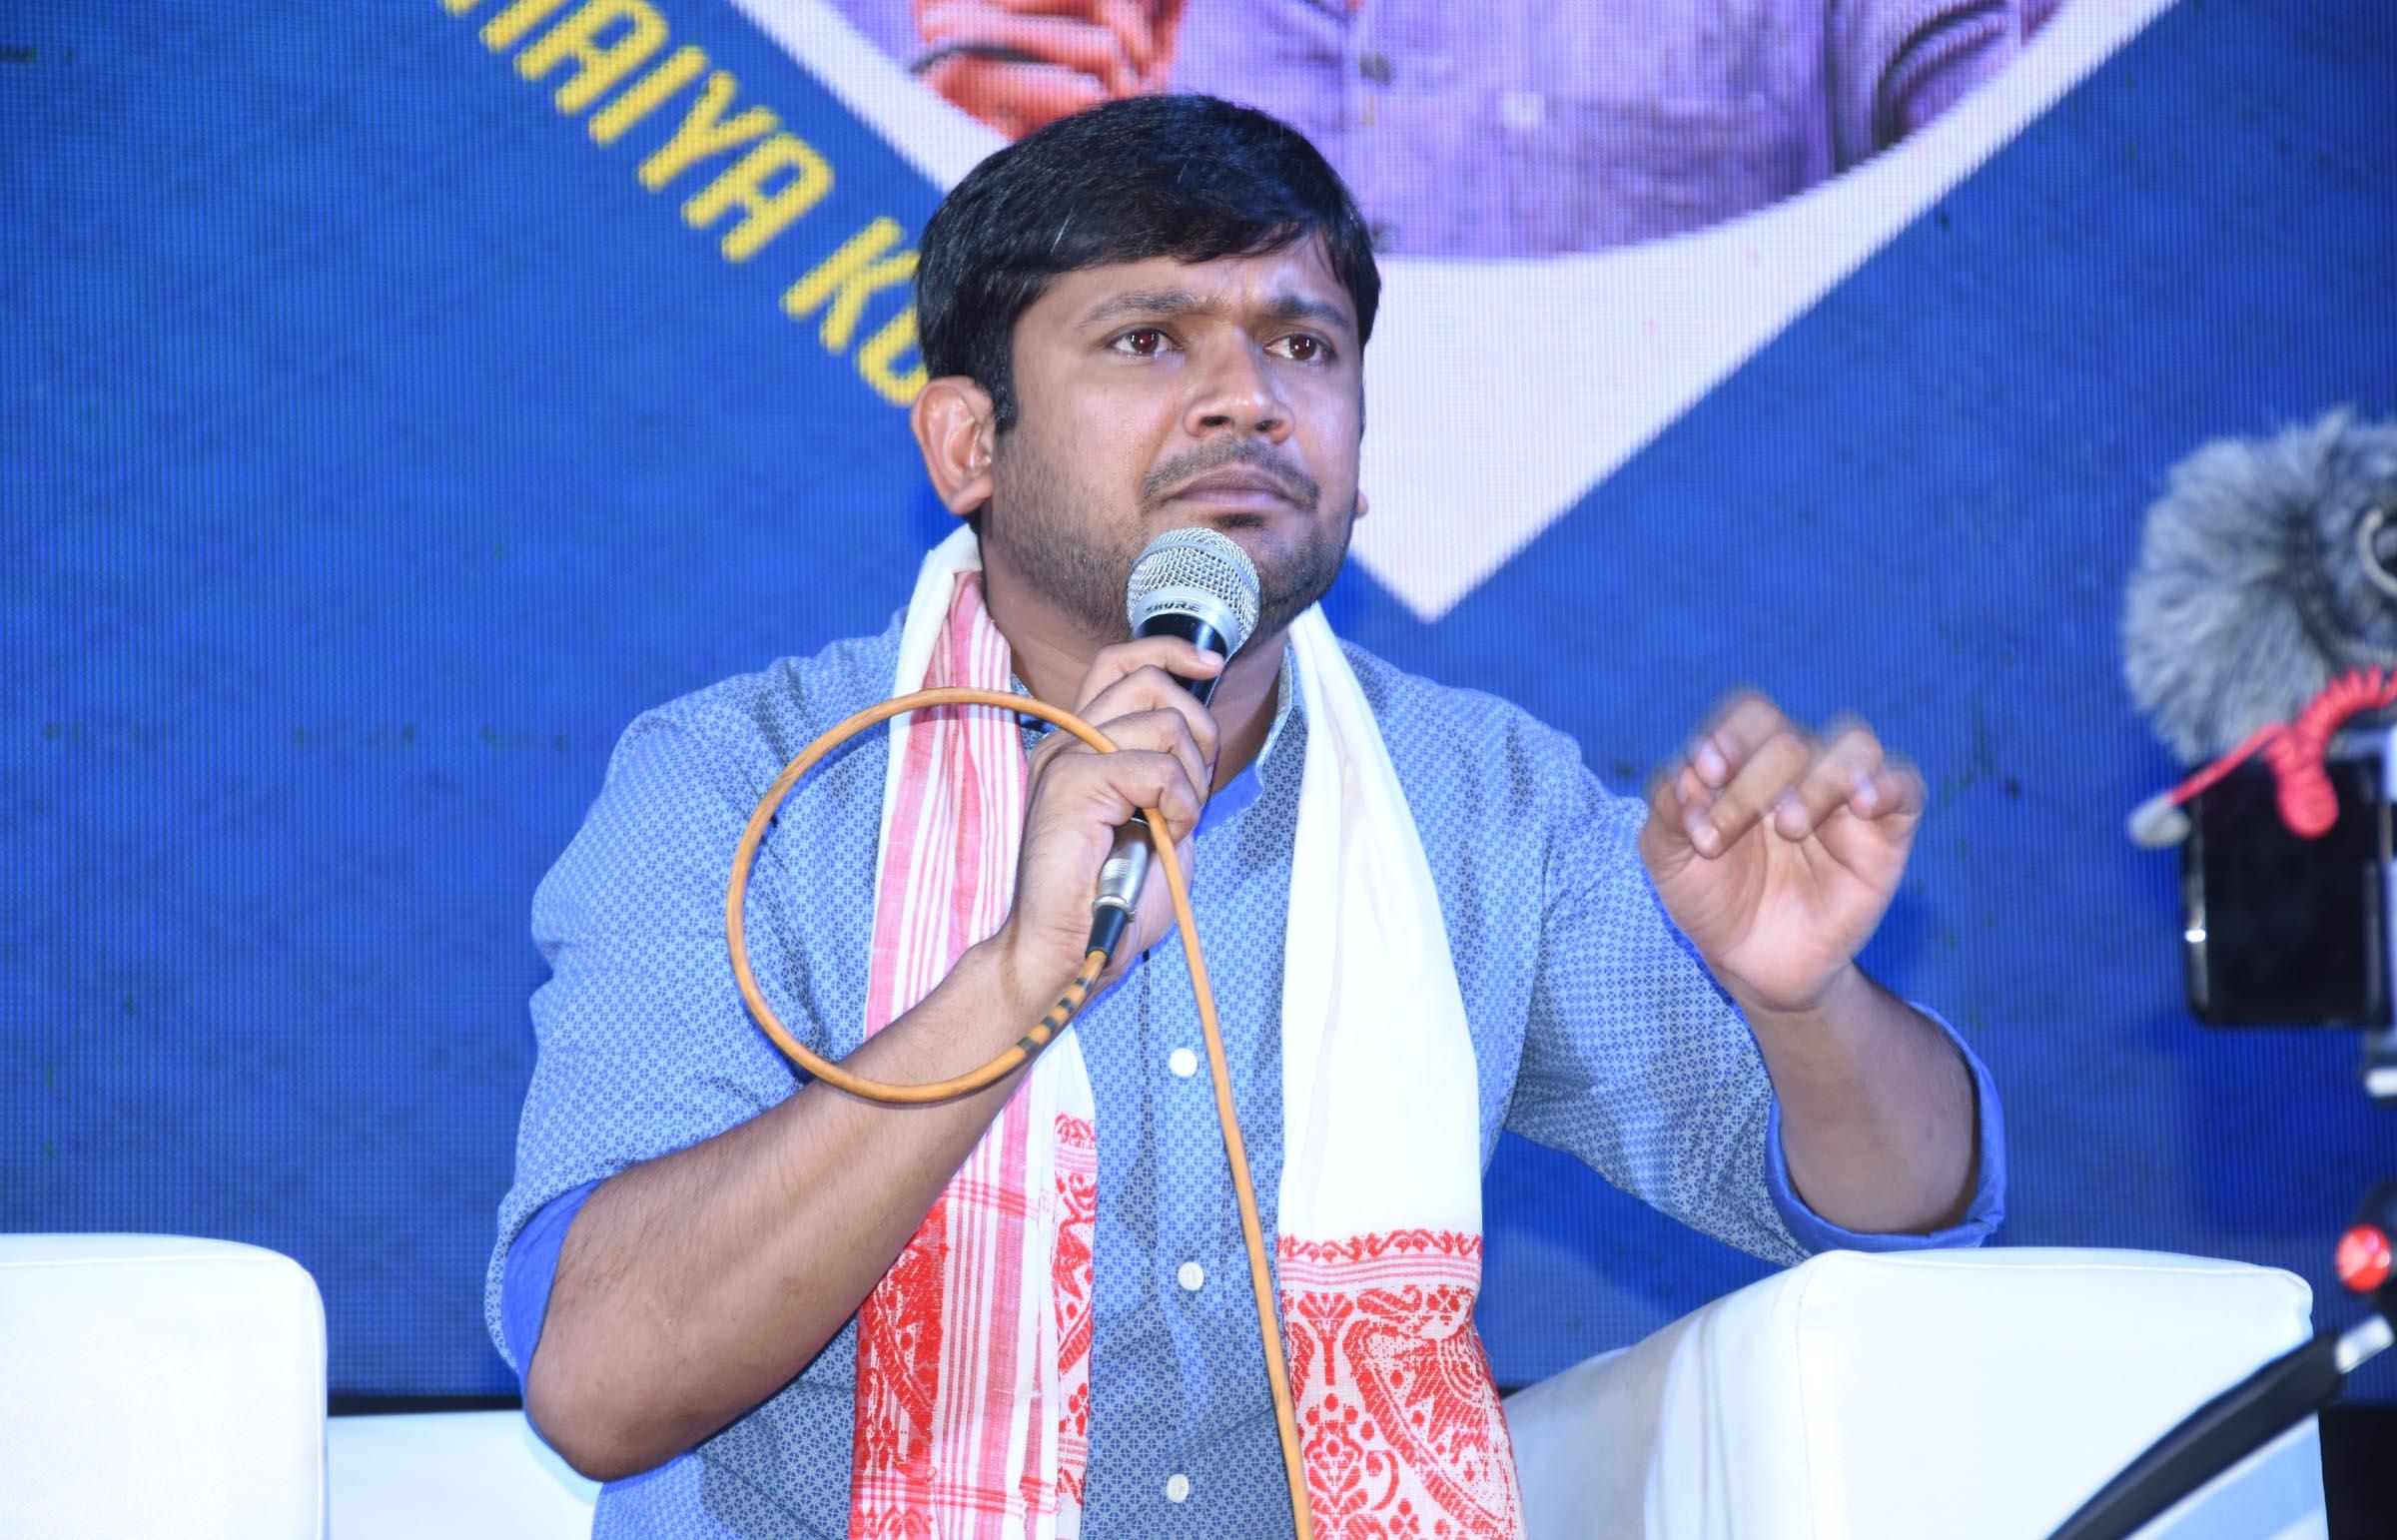 Kanhaiya Kumar was in Gwalior to address a seminar as part of the